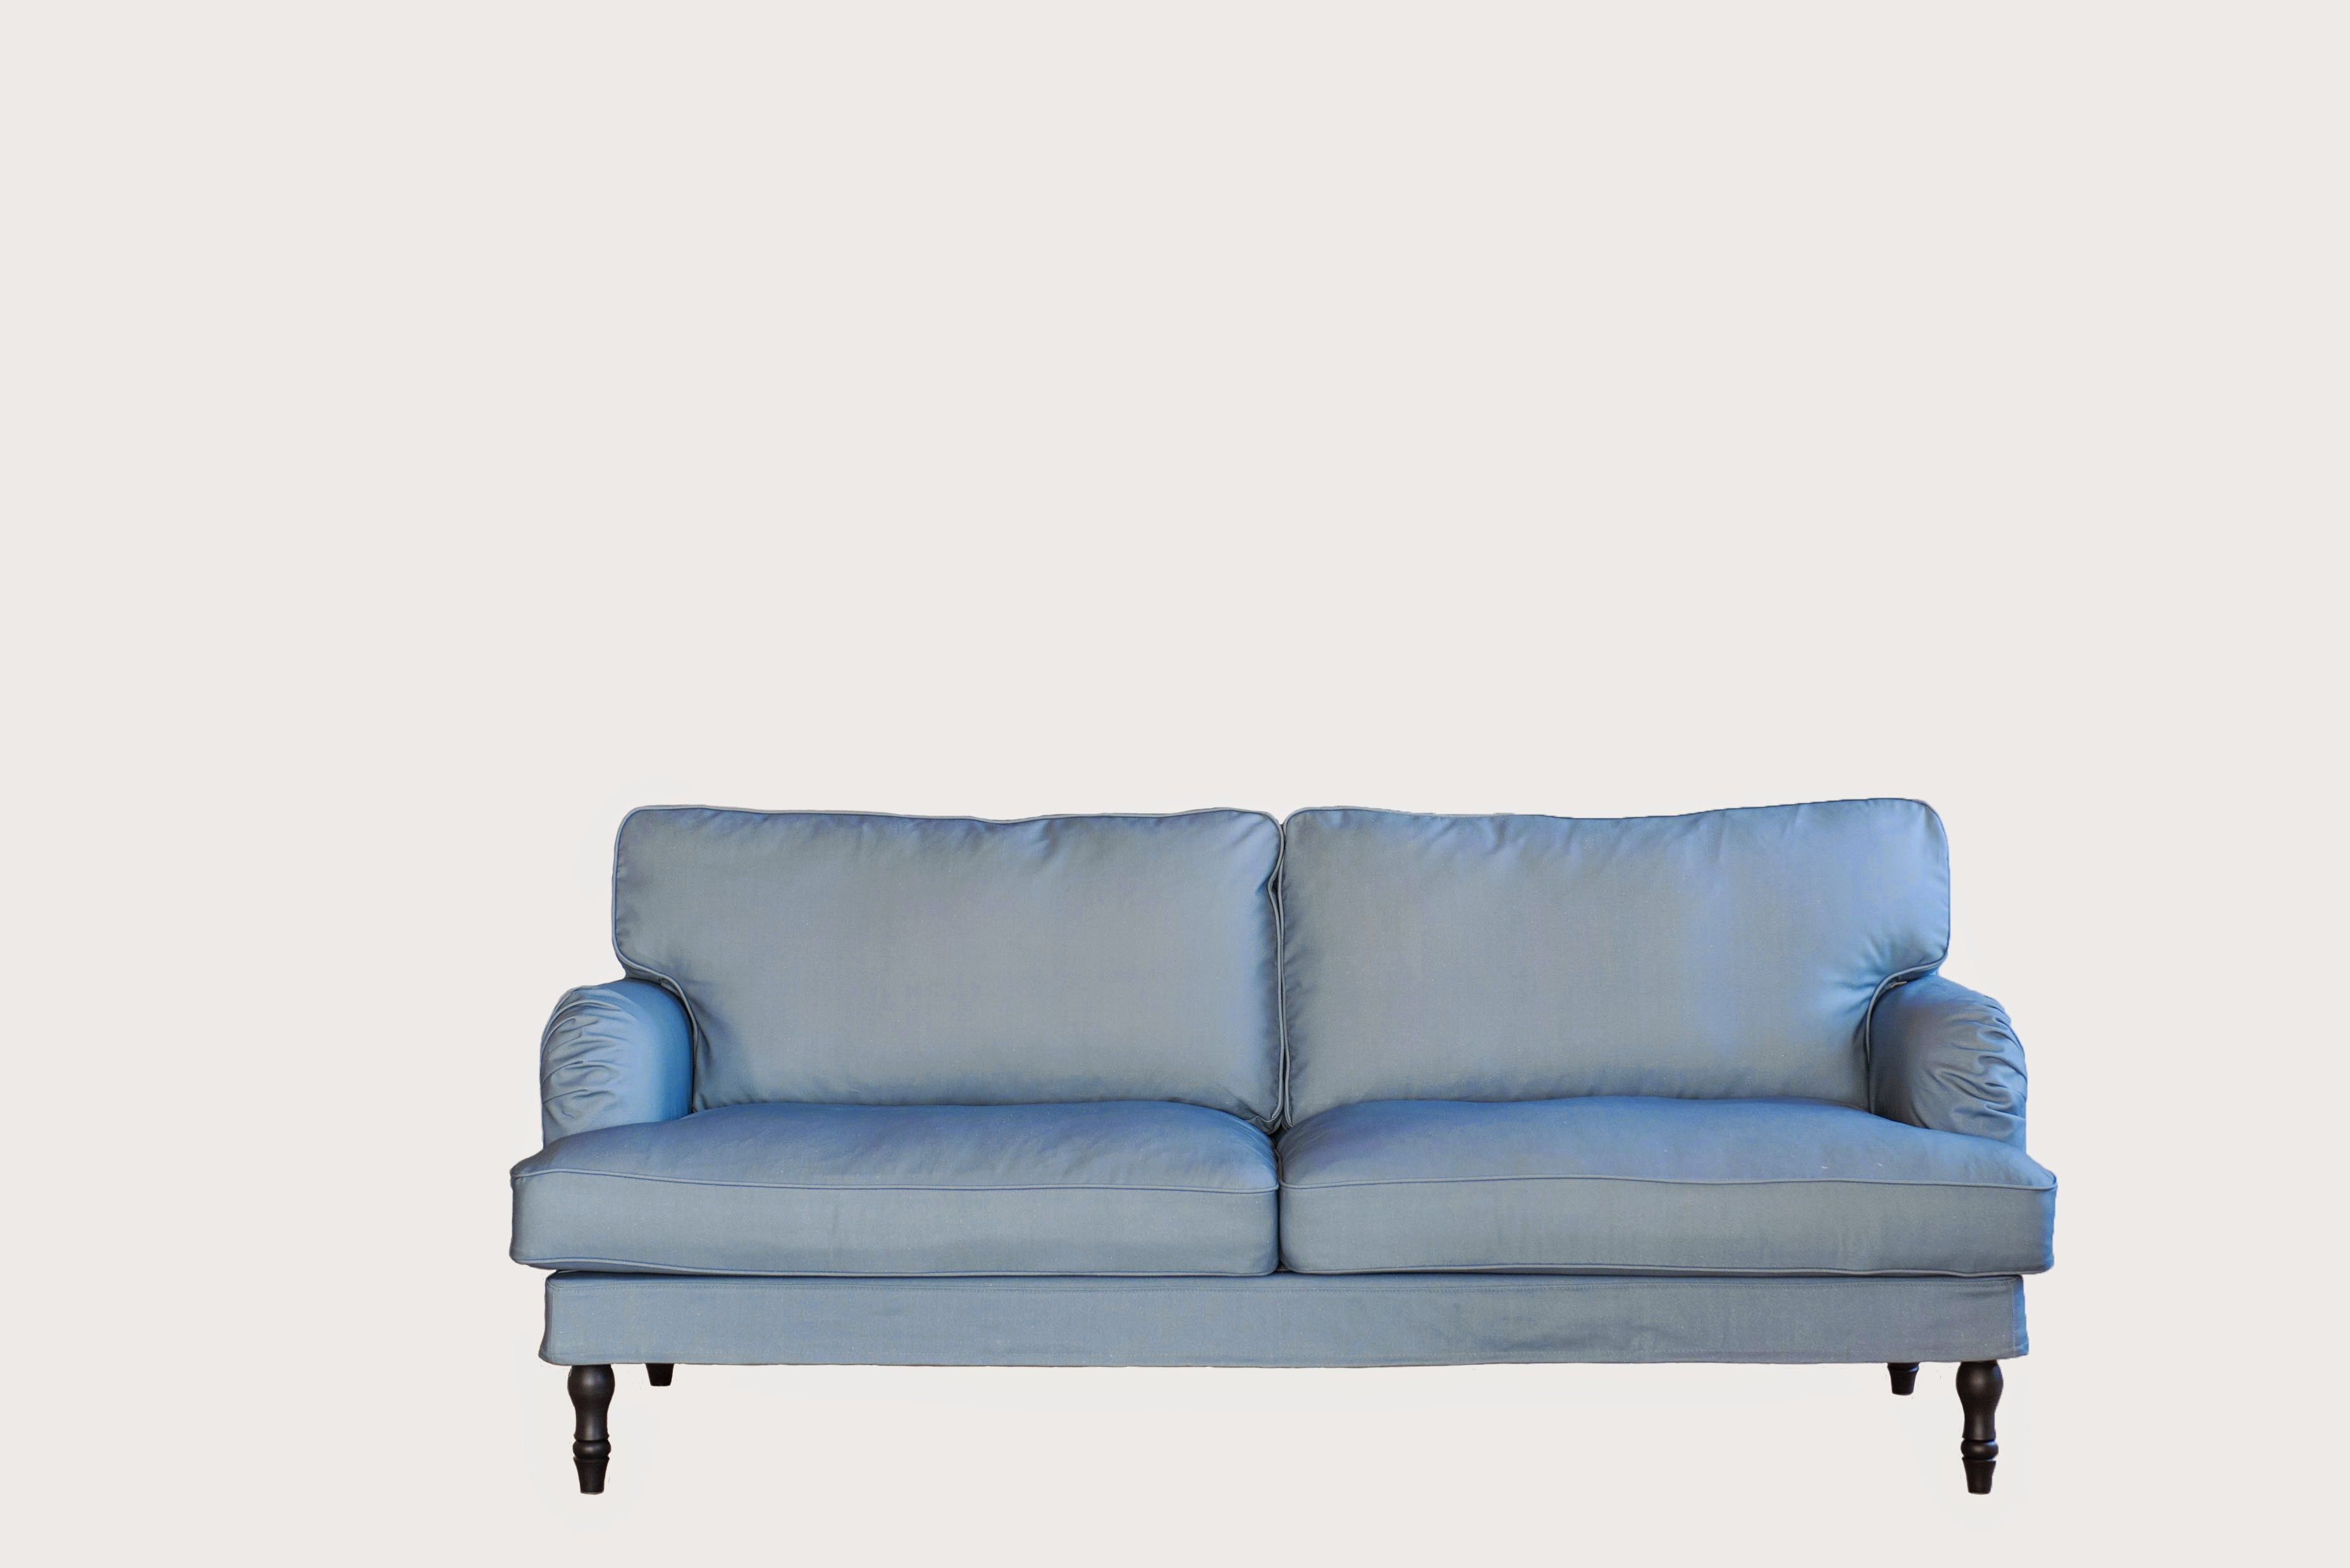 Stocksund 3 seater cover fabric Steel Blue Panama Cotton